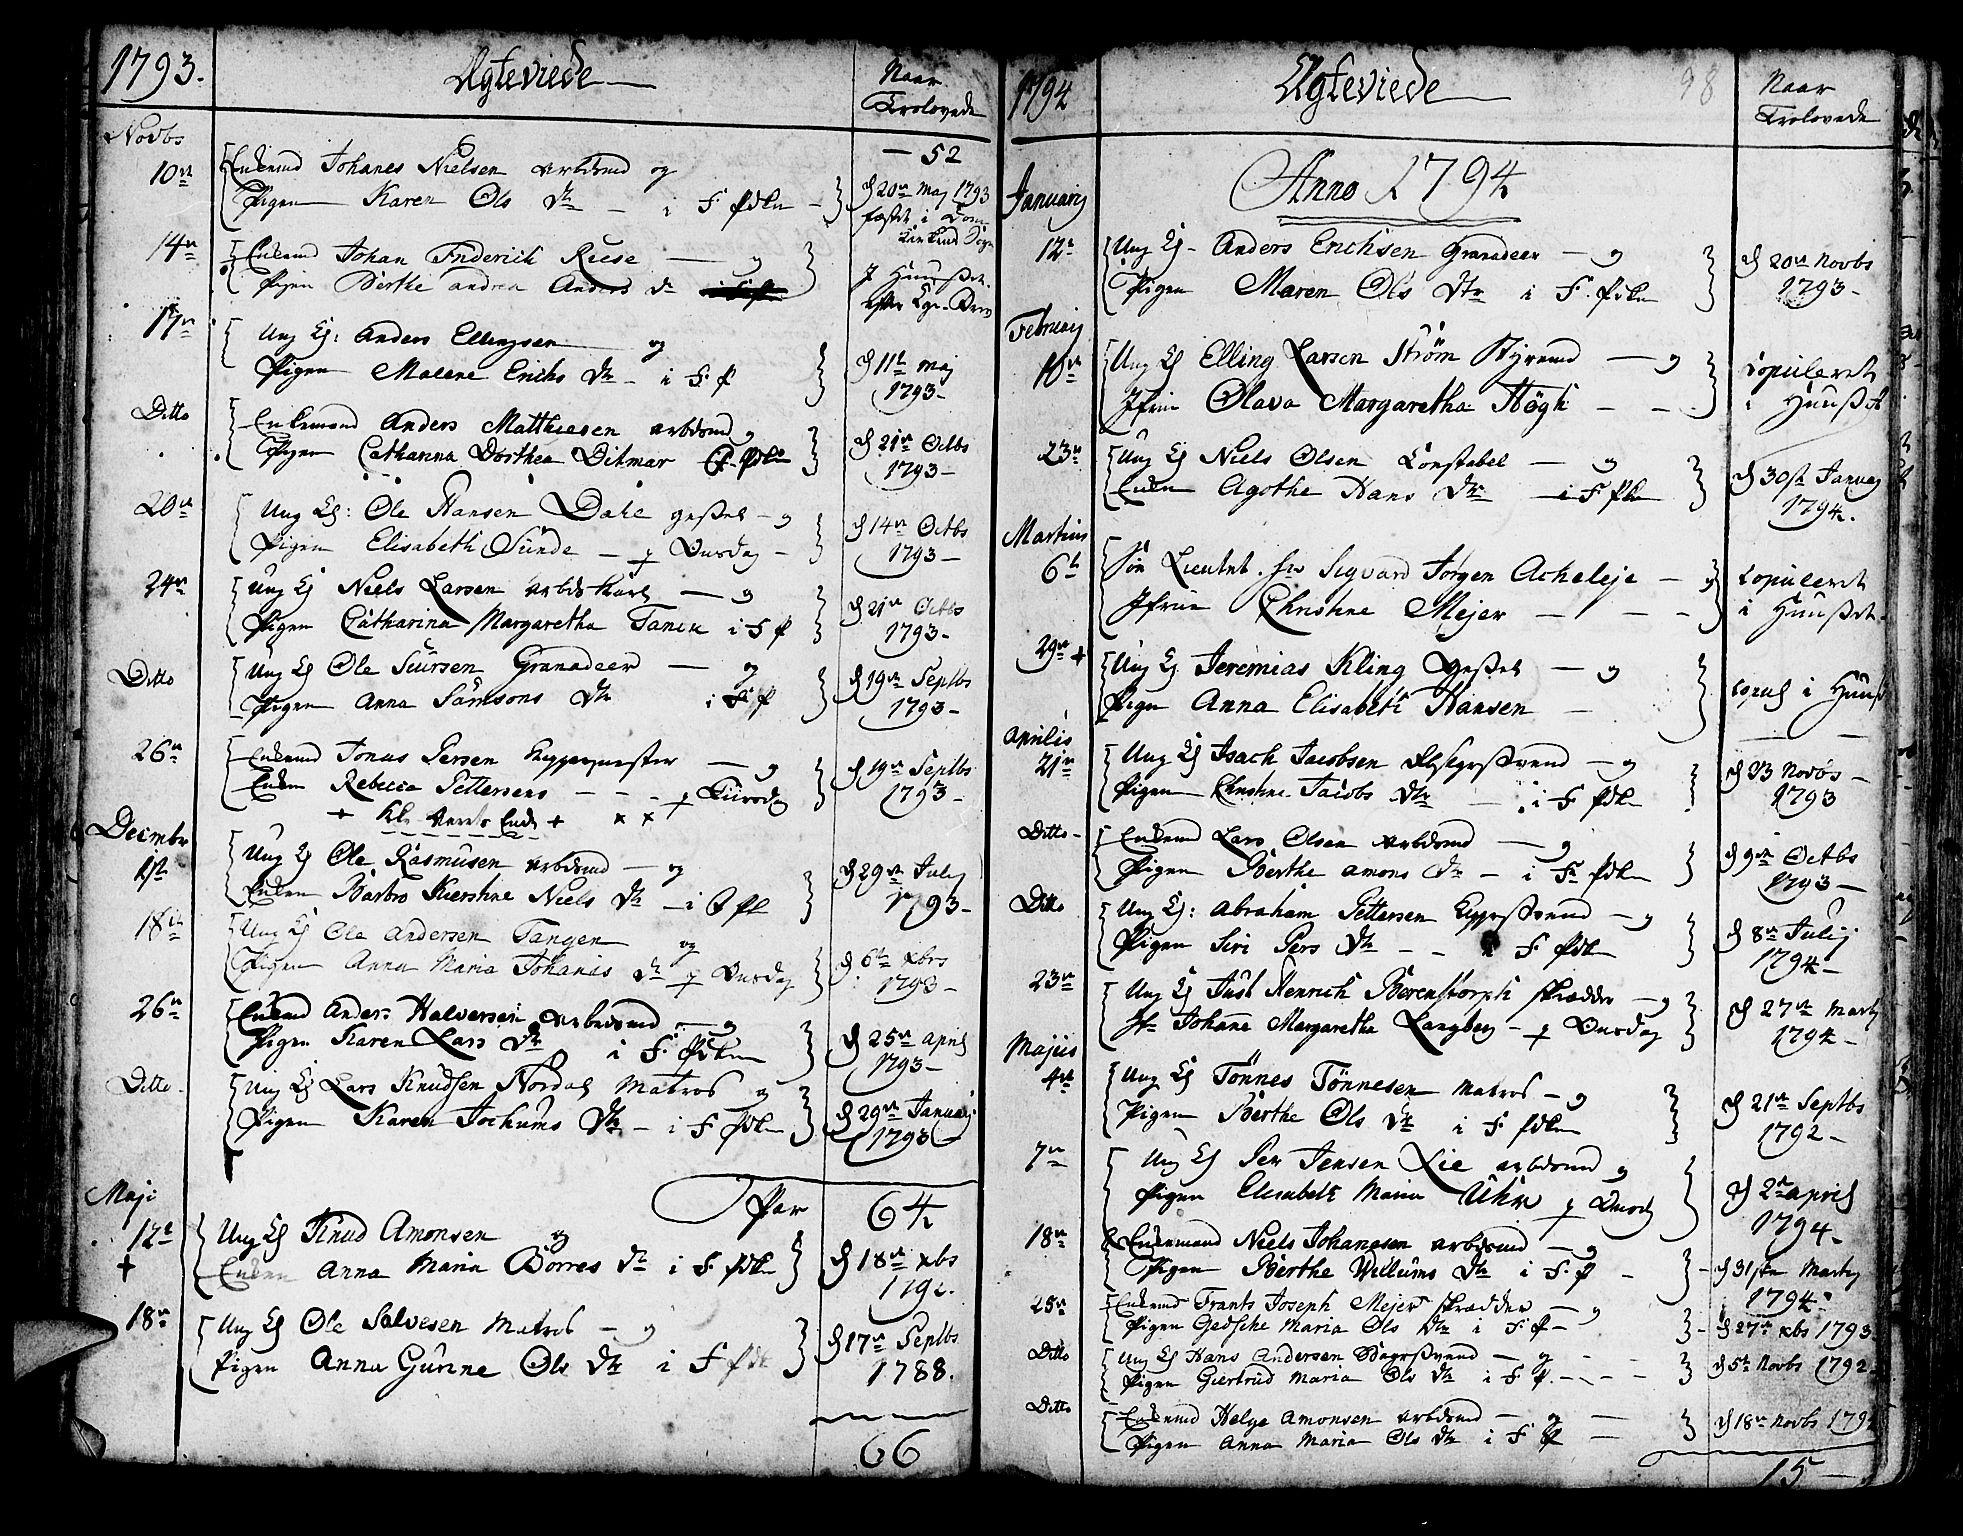 SAB, Korskirken Sokneprestembete, H/Haa/L0009: Ministerialbok nr. A 9, 1743-1861, s. 98